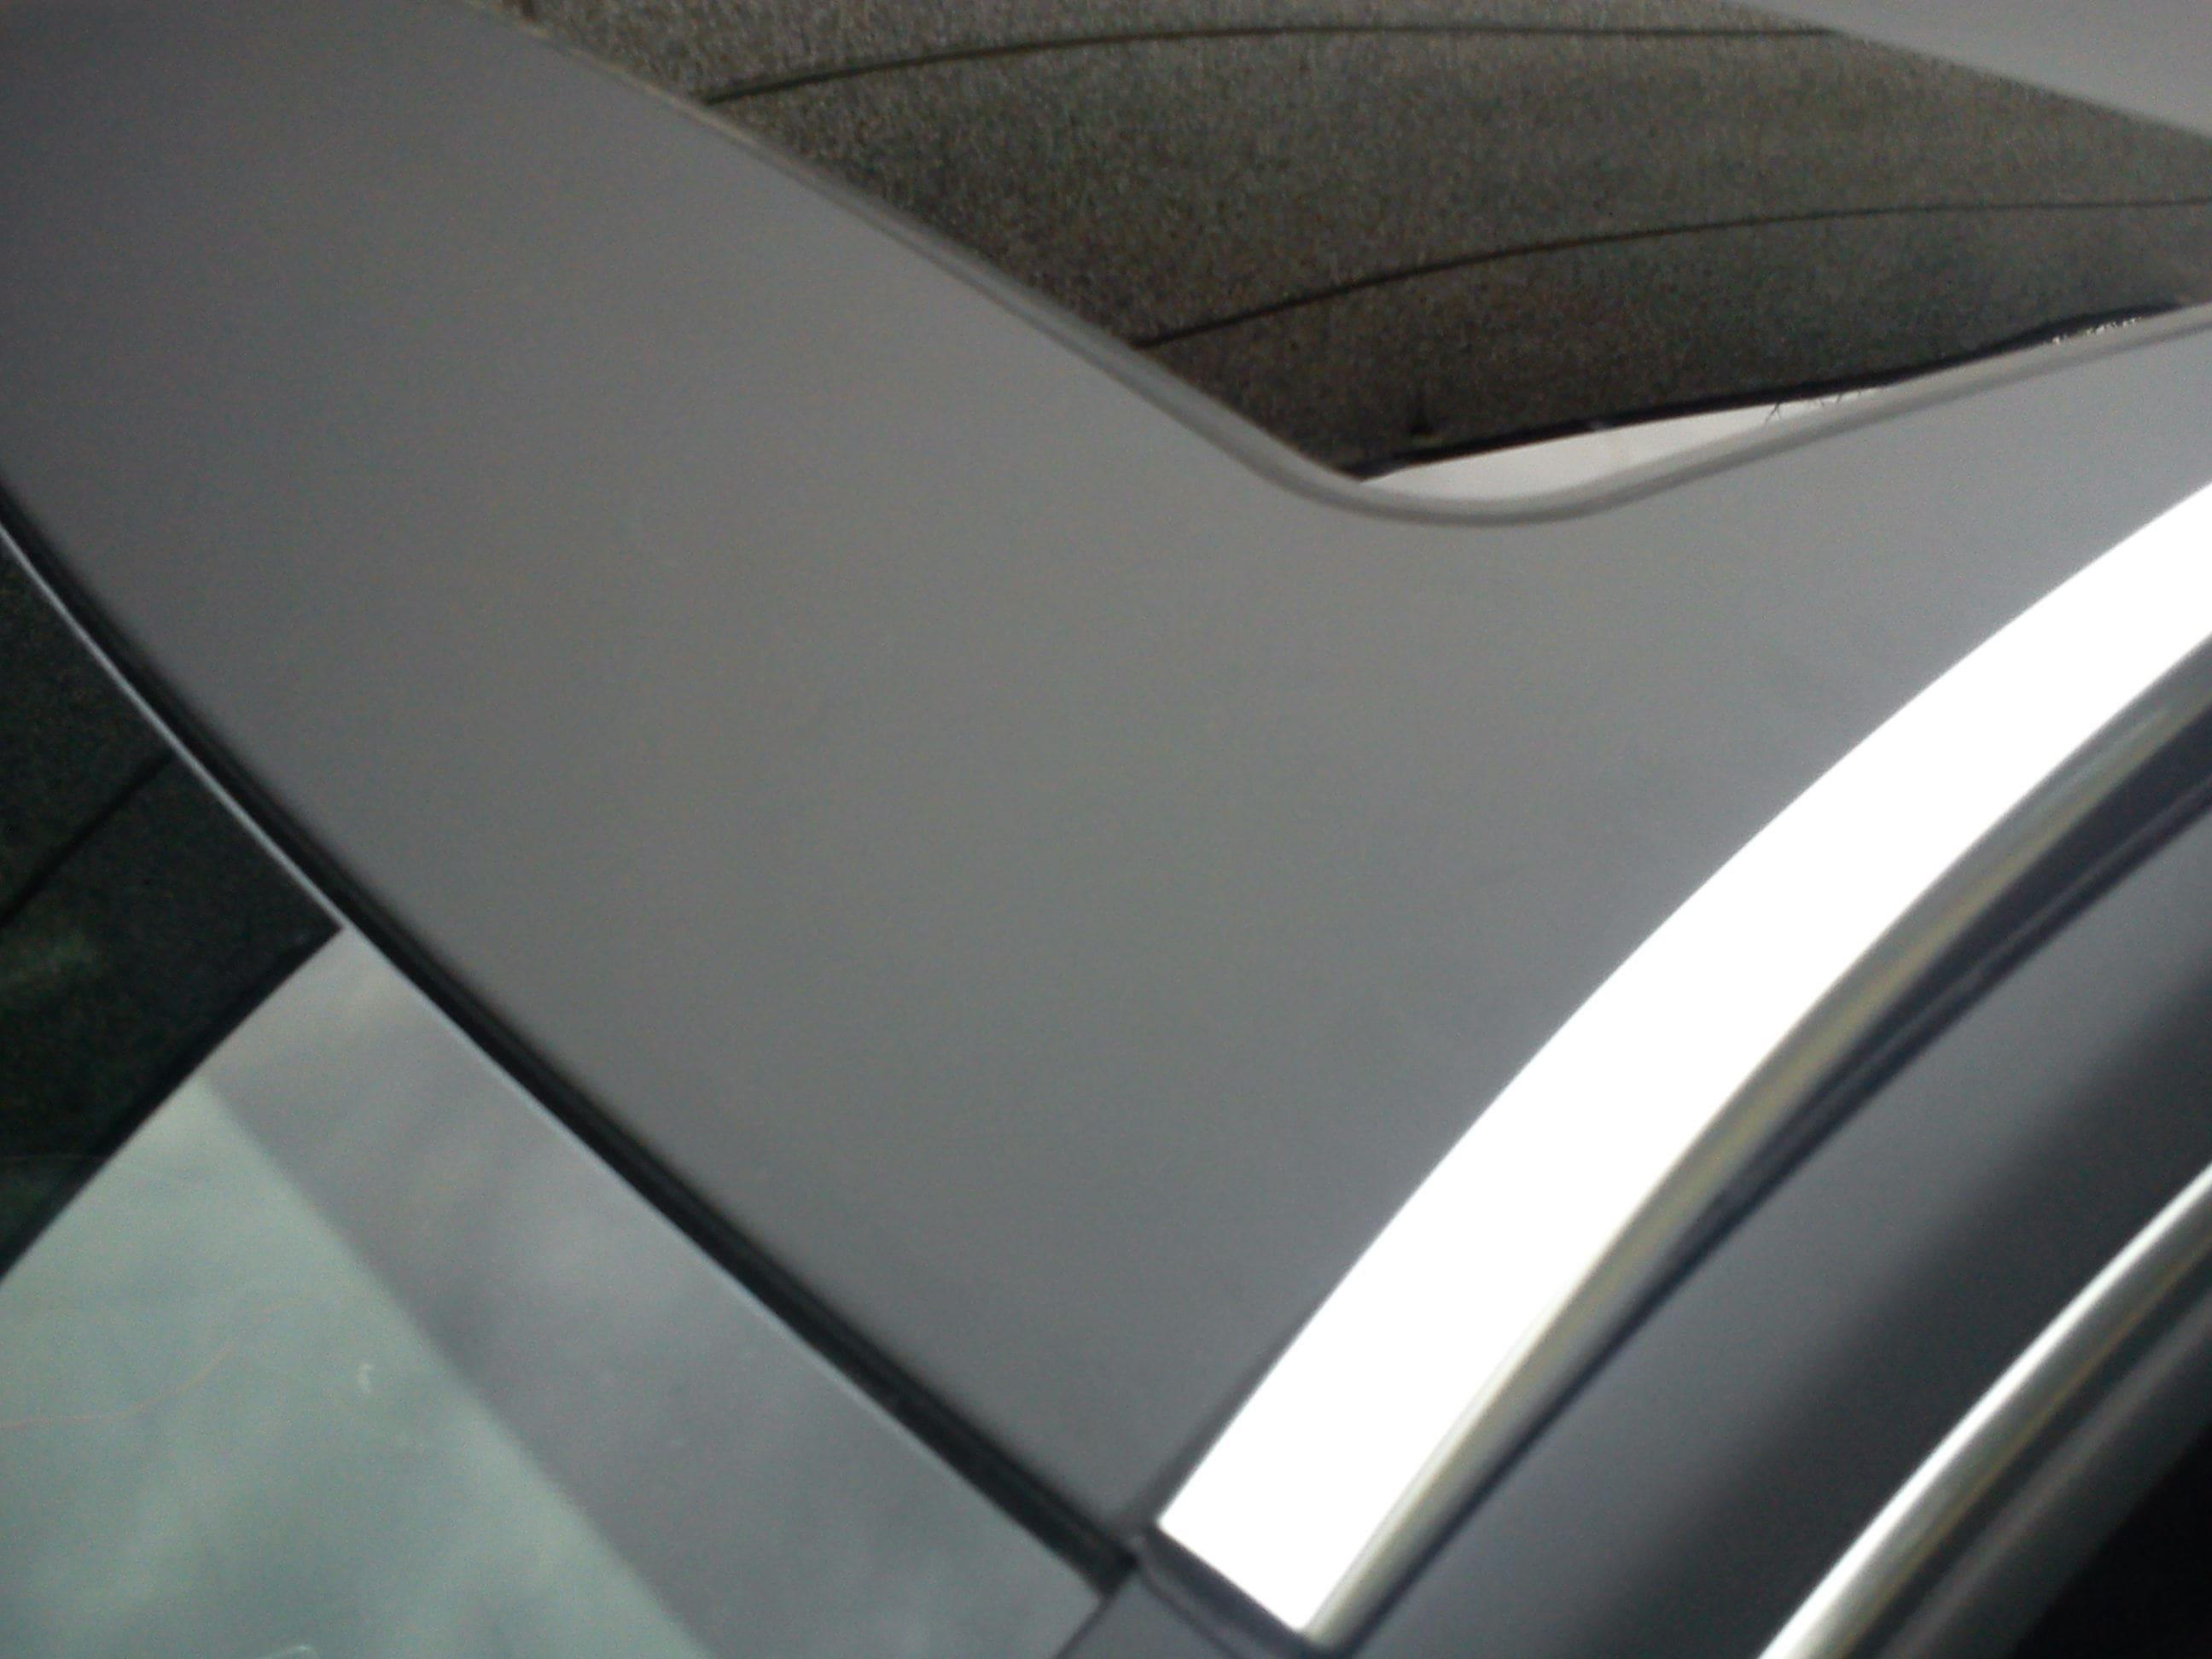 Mercedes E320 met Mat Zwarte Wrap, Carwrapping door Wrapmyride.nu Foto-nr:6235, ©2020